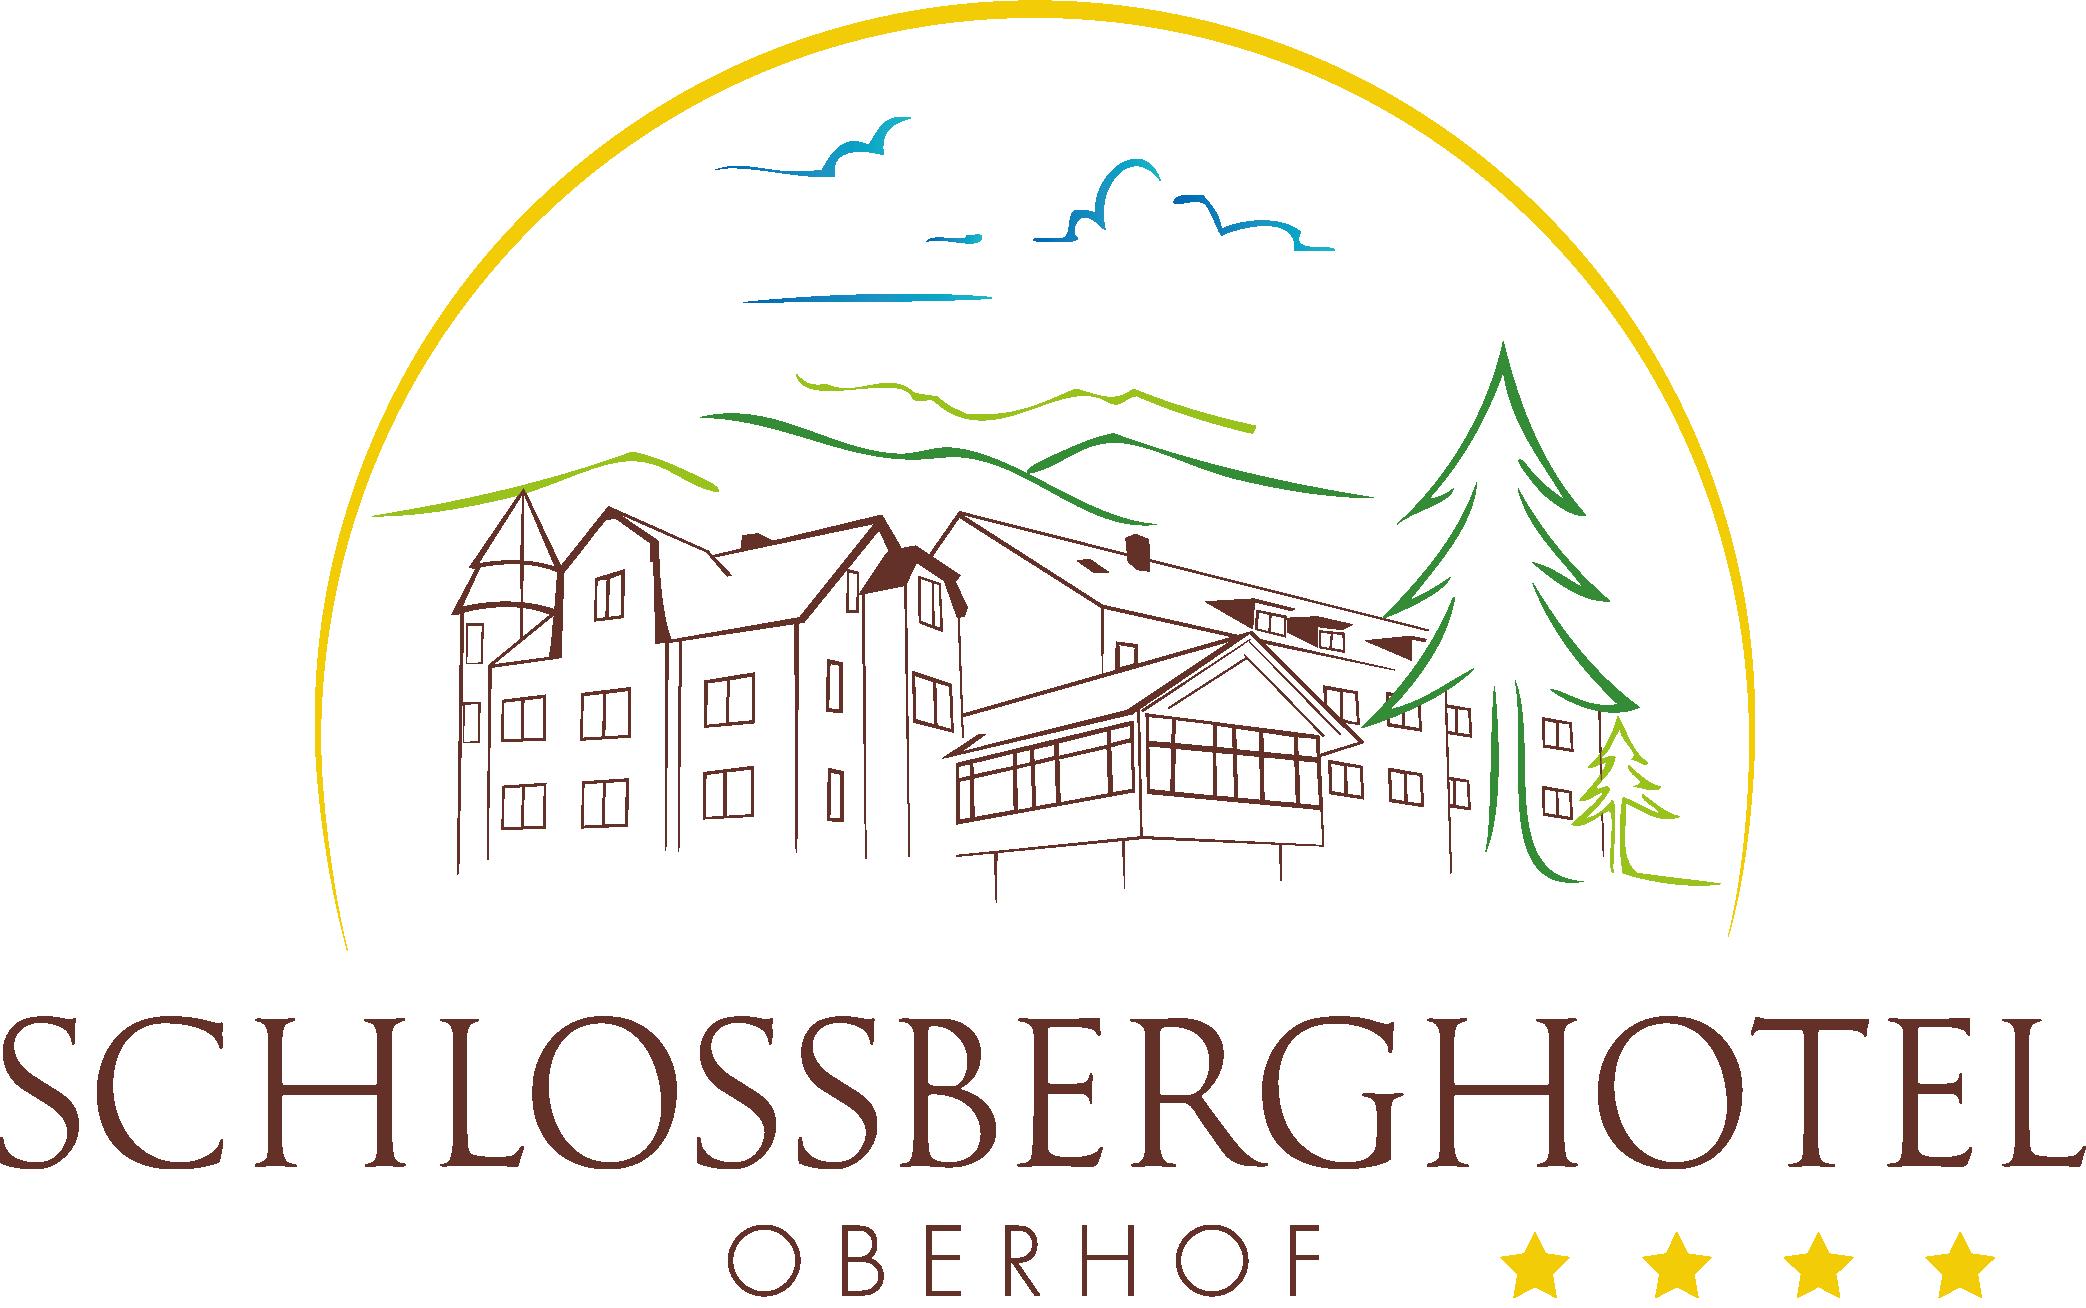 logo_schlossberghotel_4sterne